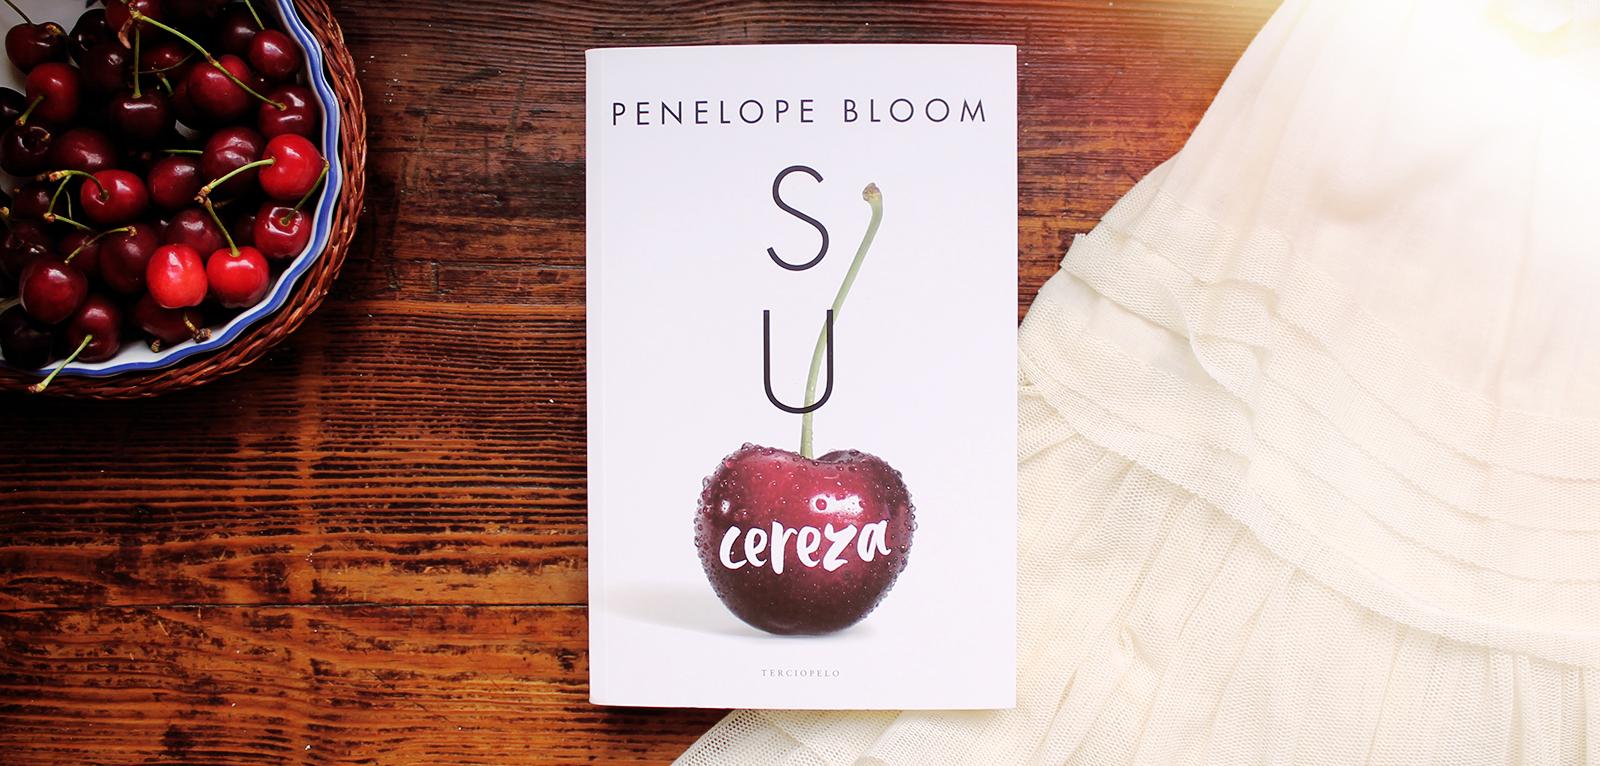 Su cereza · Penelope Bloom